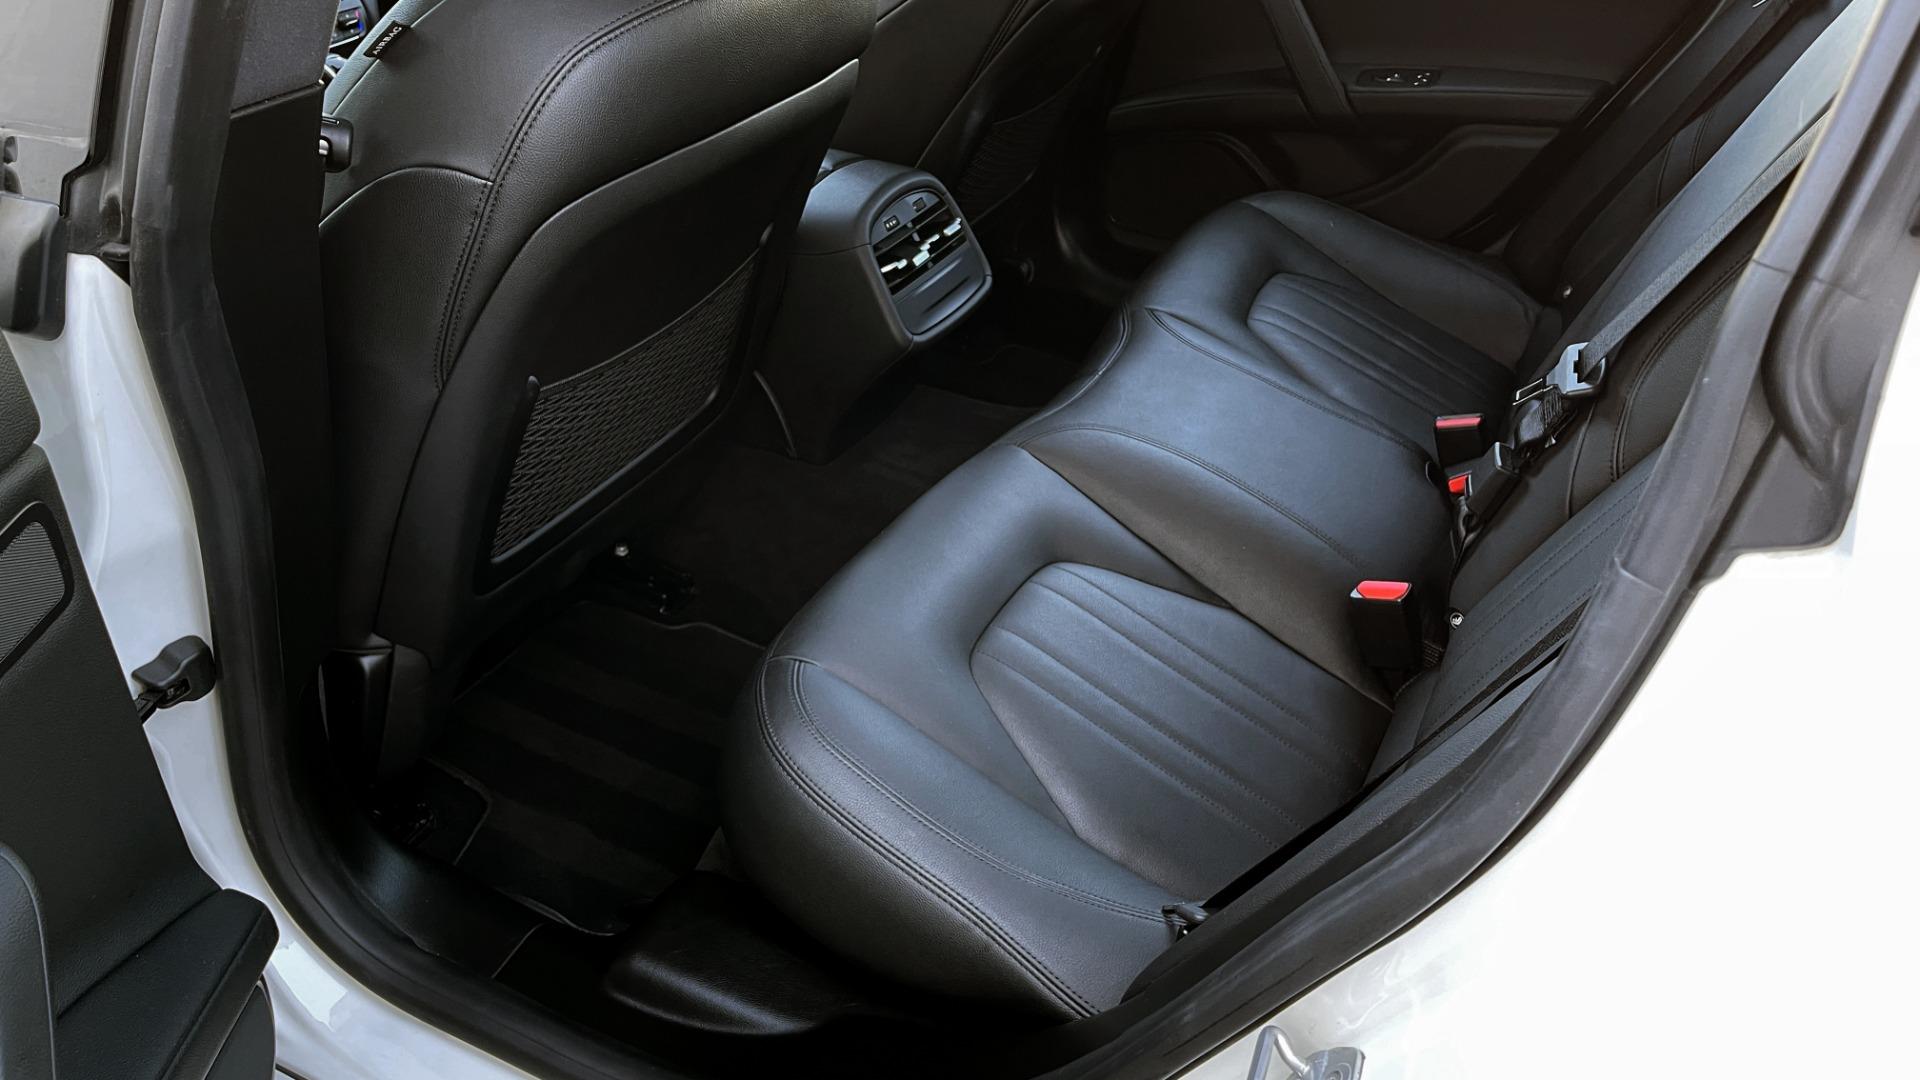 Used 2018 Maserati GHIBLI SEDAN / RWD / 3.0L V6 / SUNROOF / NAV / REARVIEW for sale $42,995 at Formula Imports in Charlotte NC 28227 51